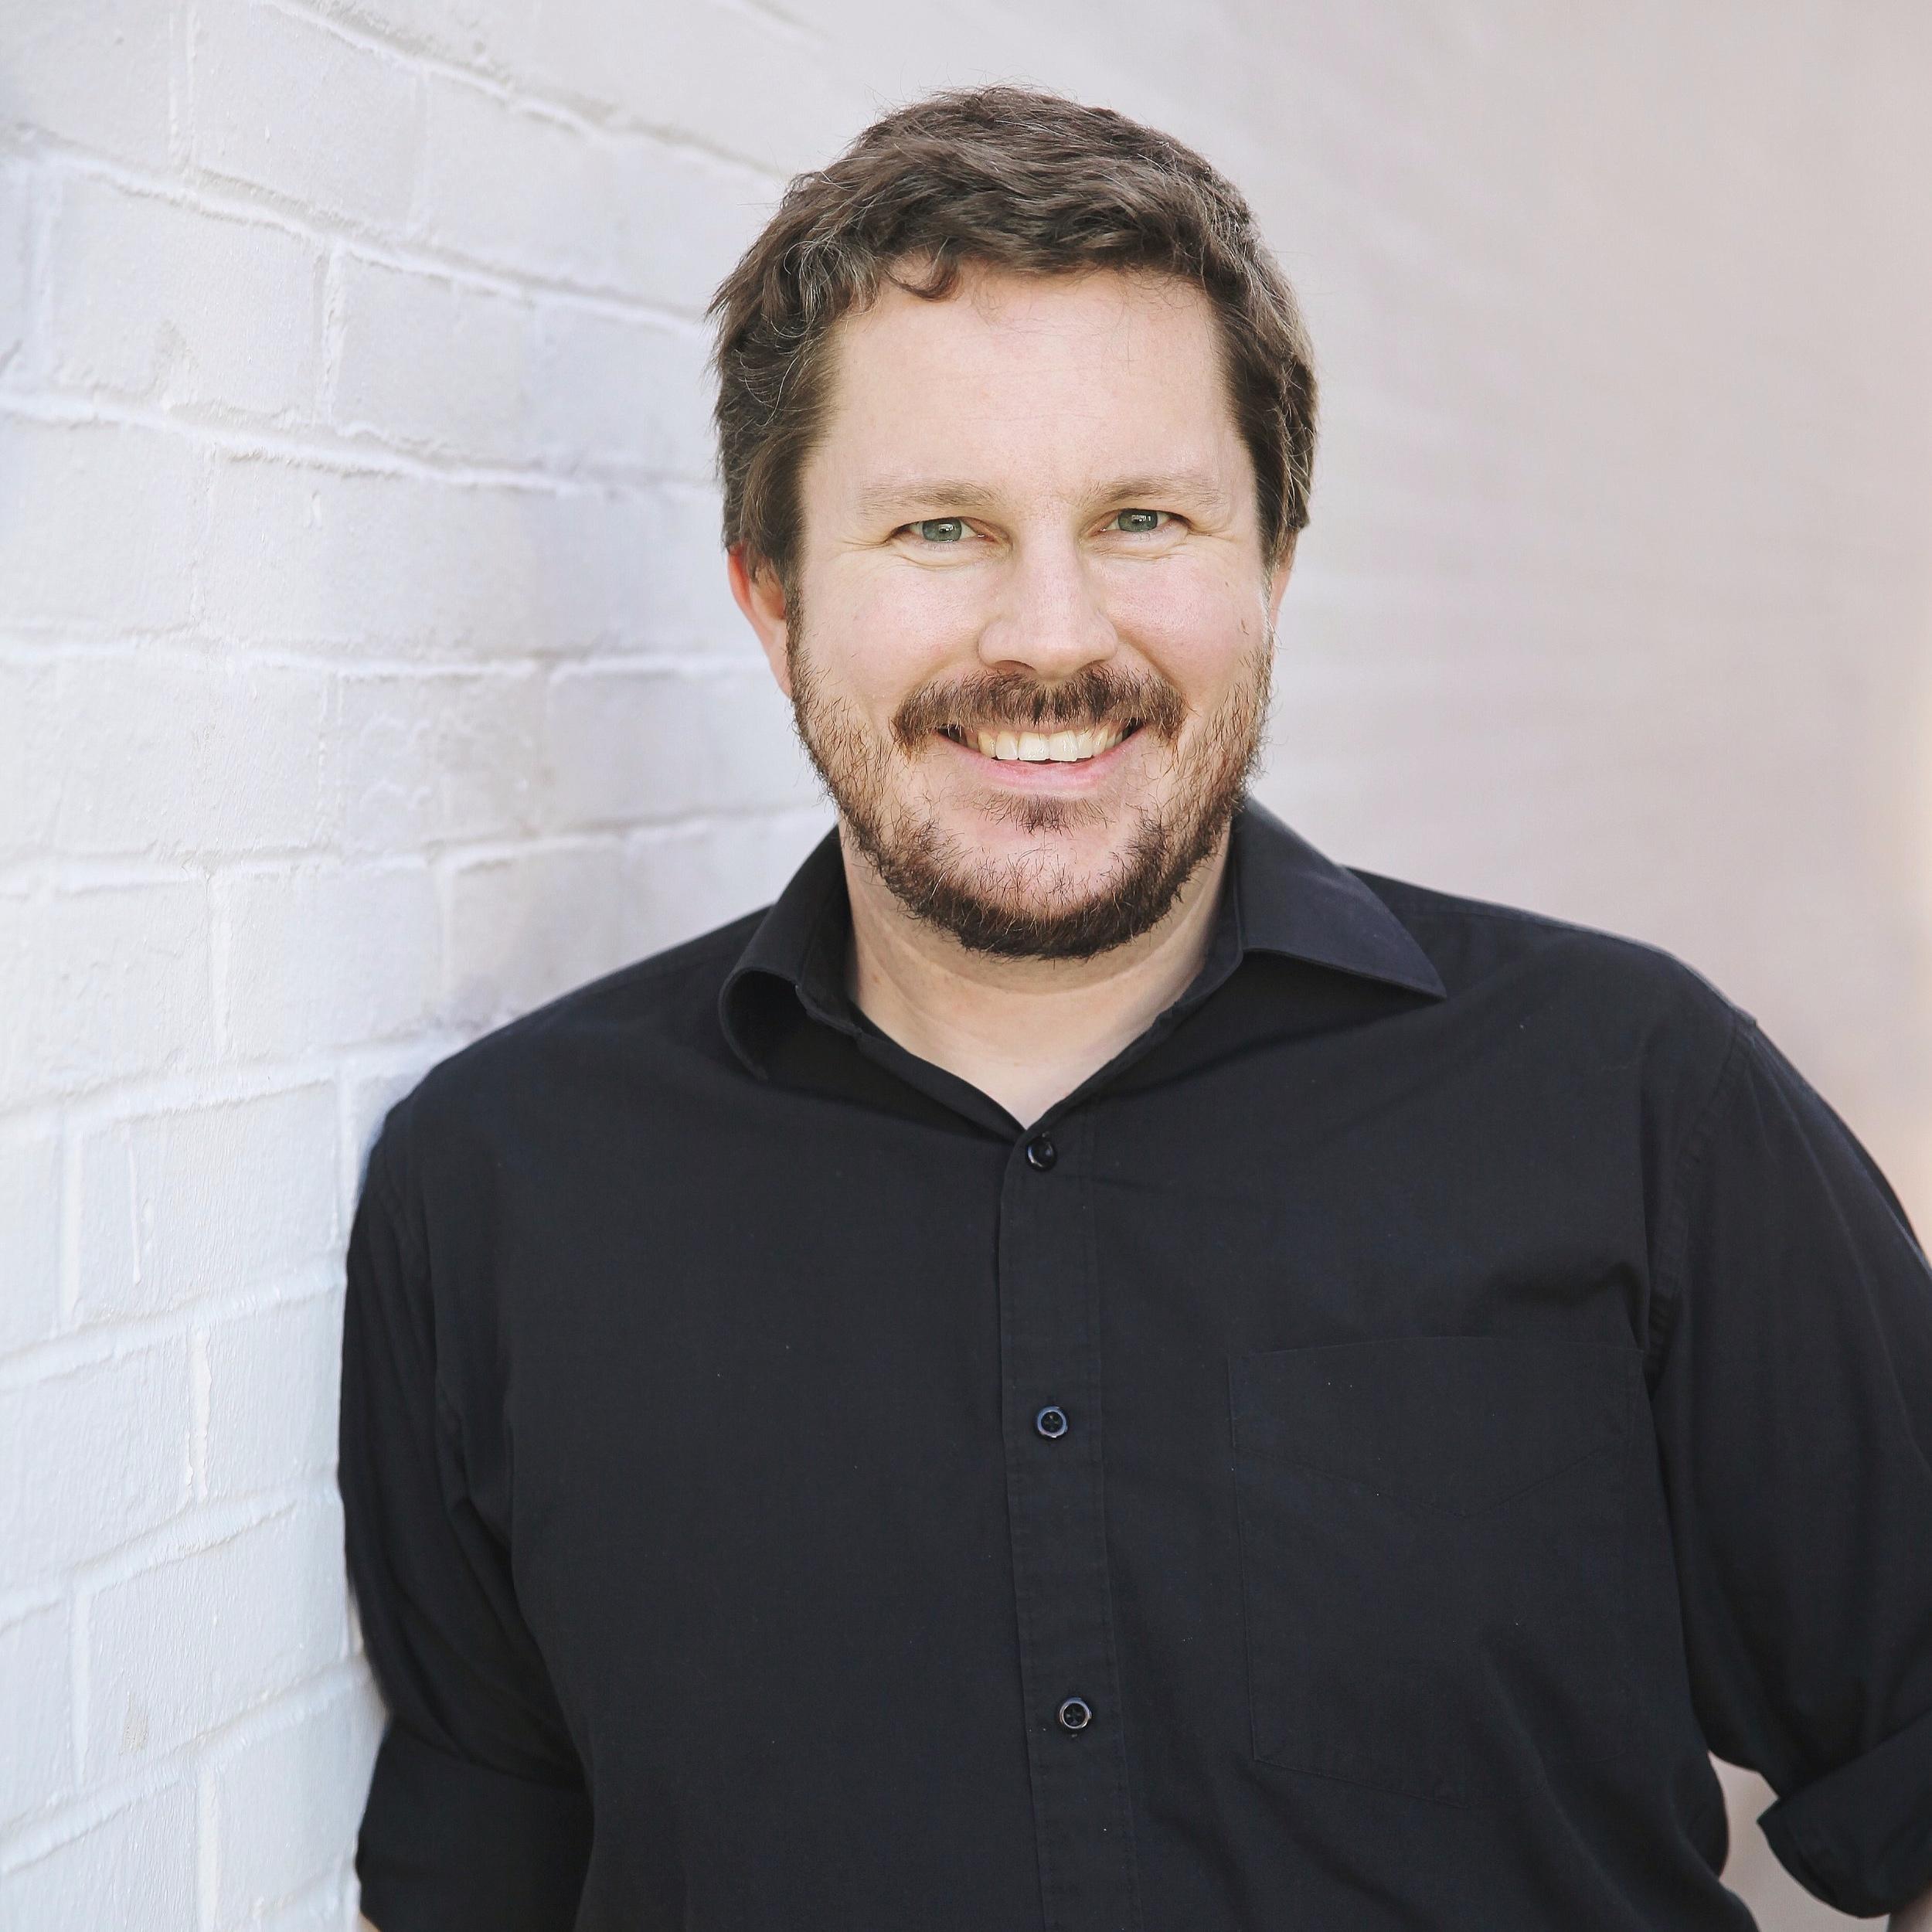 Jeremy Eshelman,Pastoral Assistant - jeremy@cpcwallingford.org